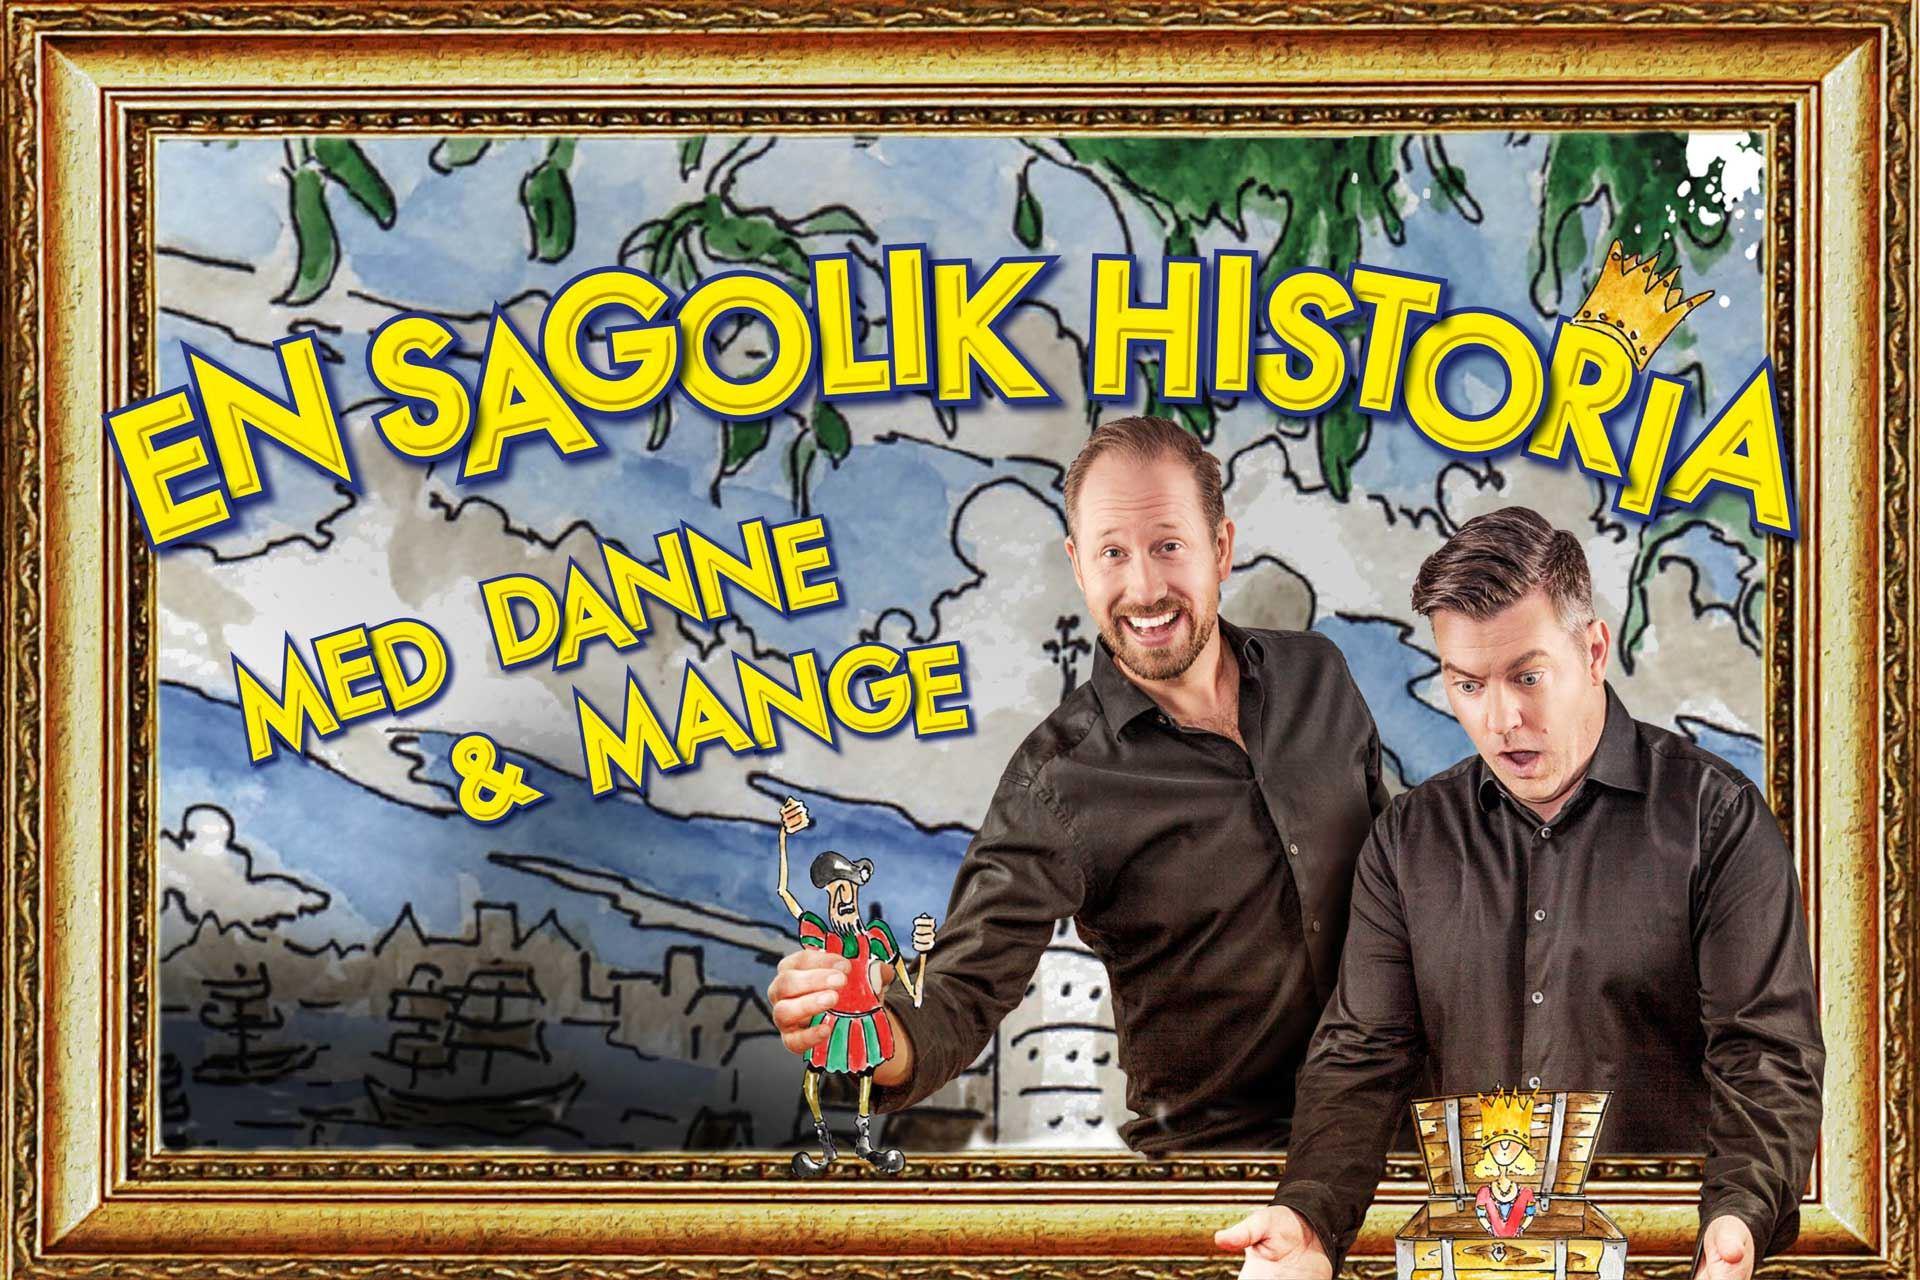 En sagolik historia